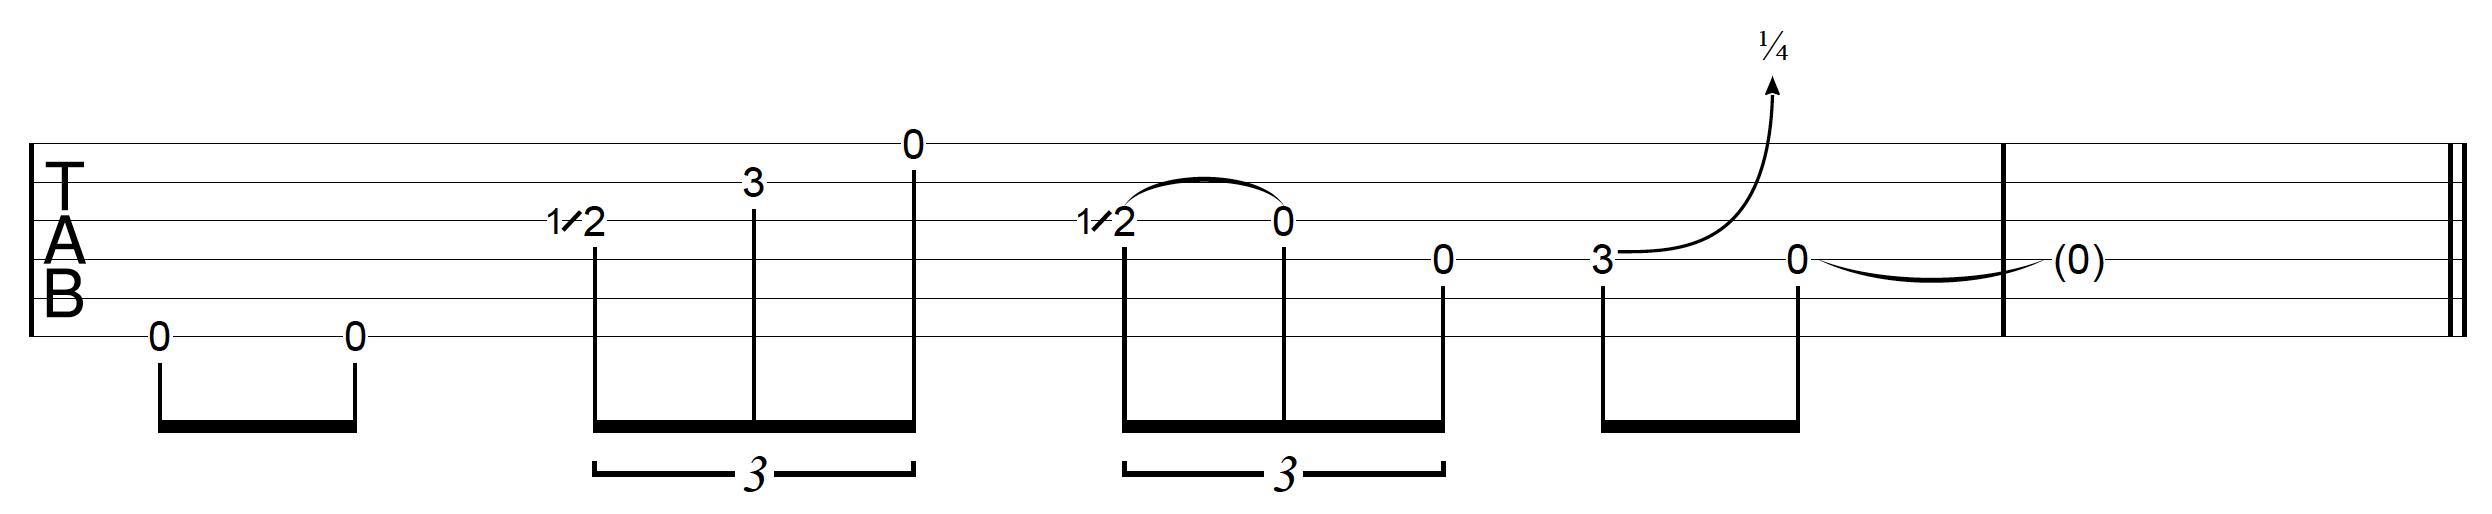 DADGAD Guitar Blues Drone Lick 4